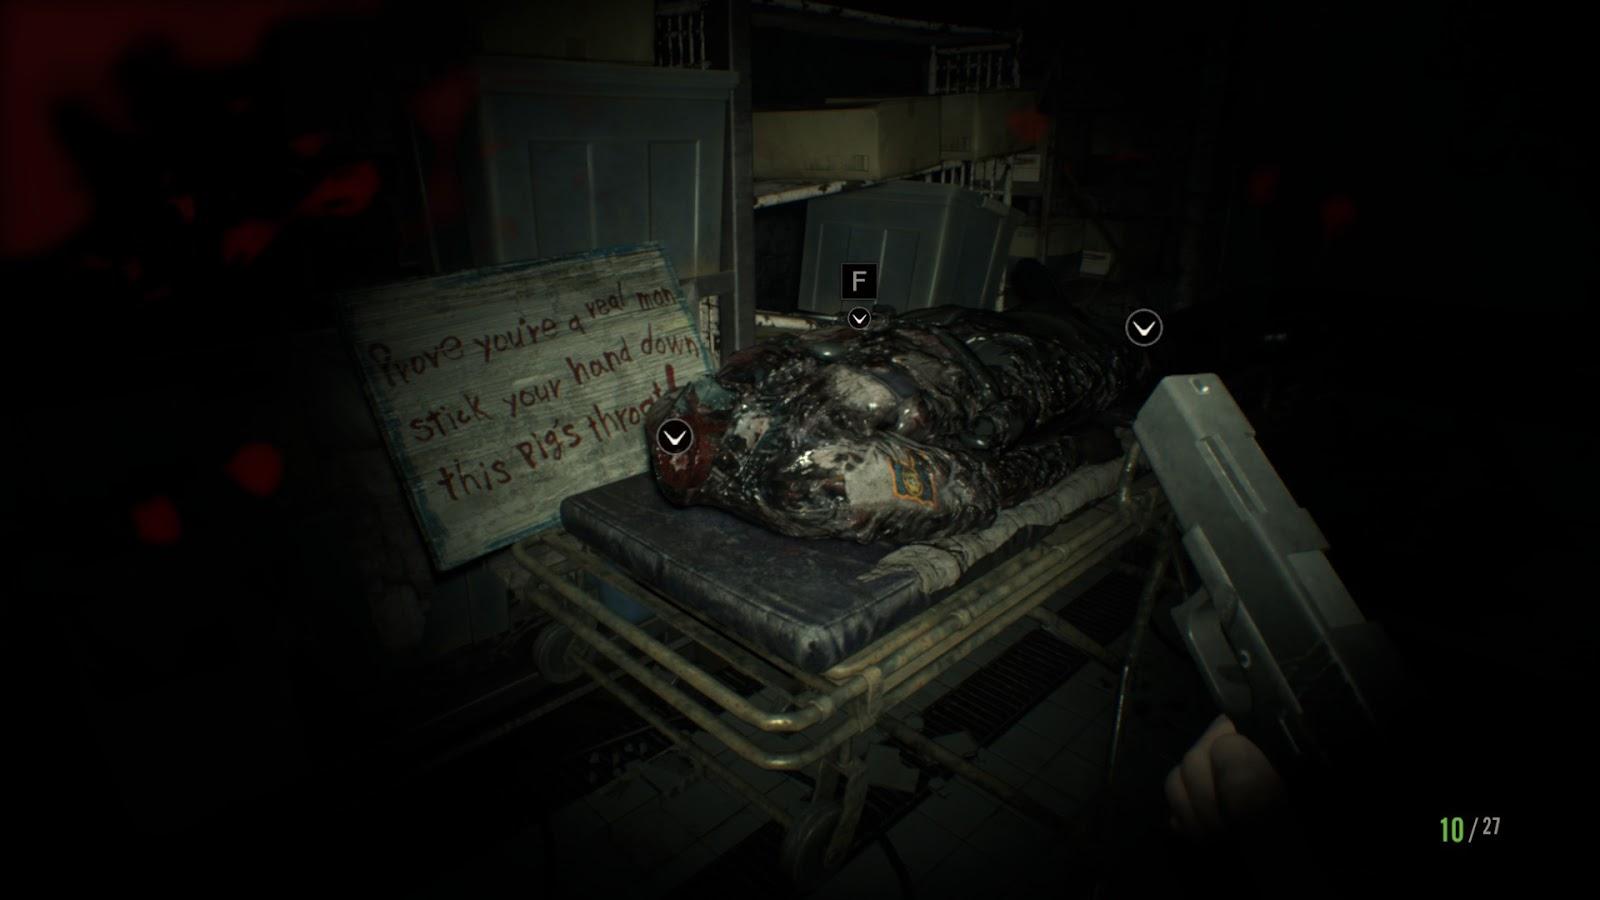 The Nocturnal Rambler Resident Evil 7 Survival Horror S Back Baby